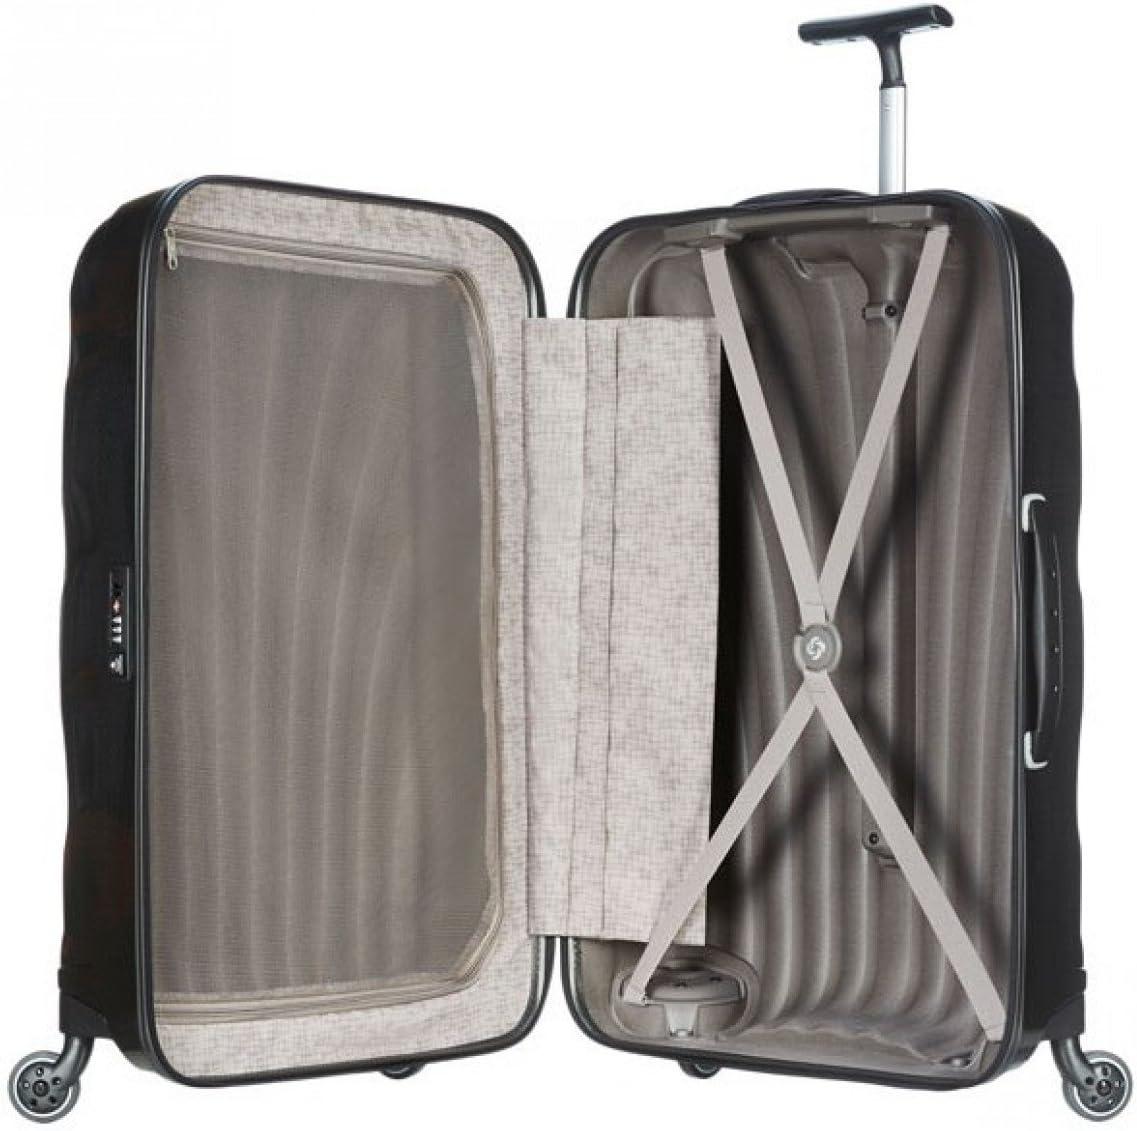 Samsonite Luggage Black Label Cosmolite 2 Piece Spinner Luggage Set, 32 and 20 One size, Black